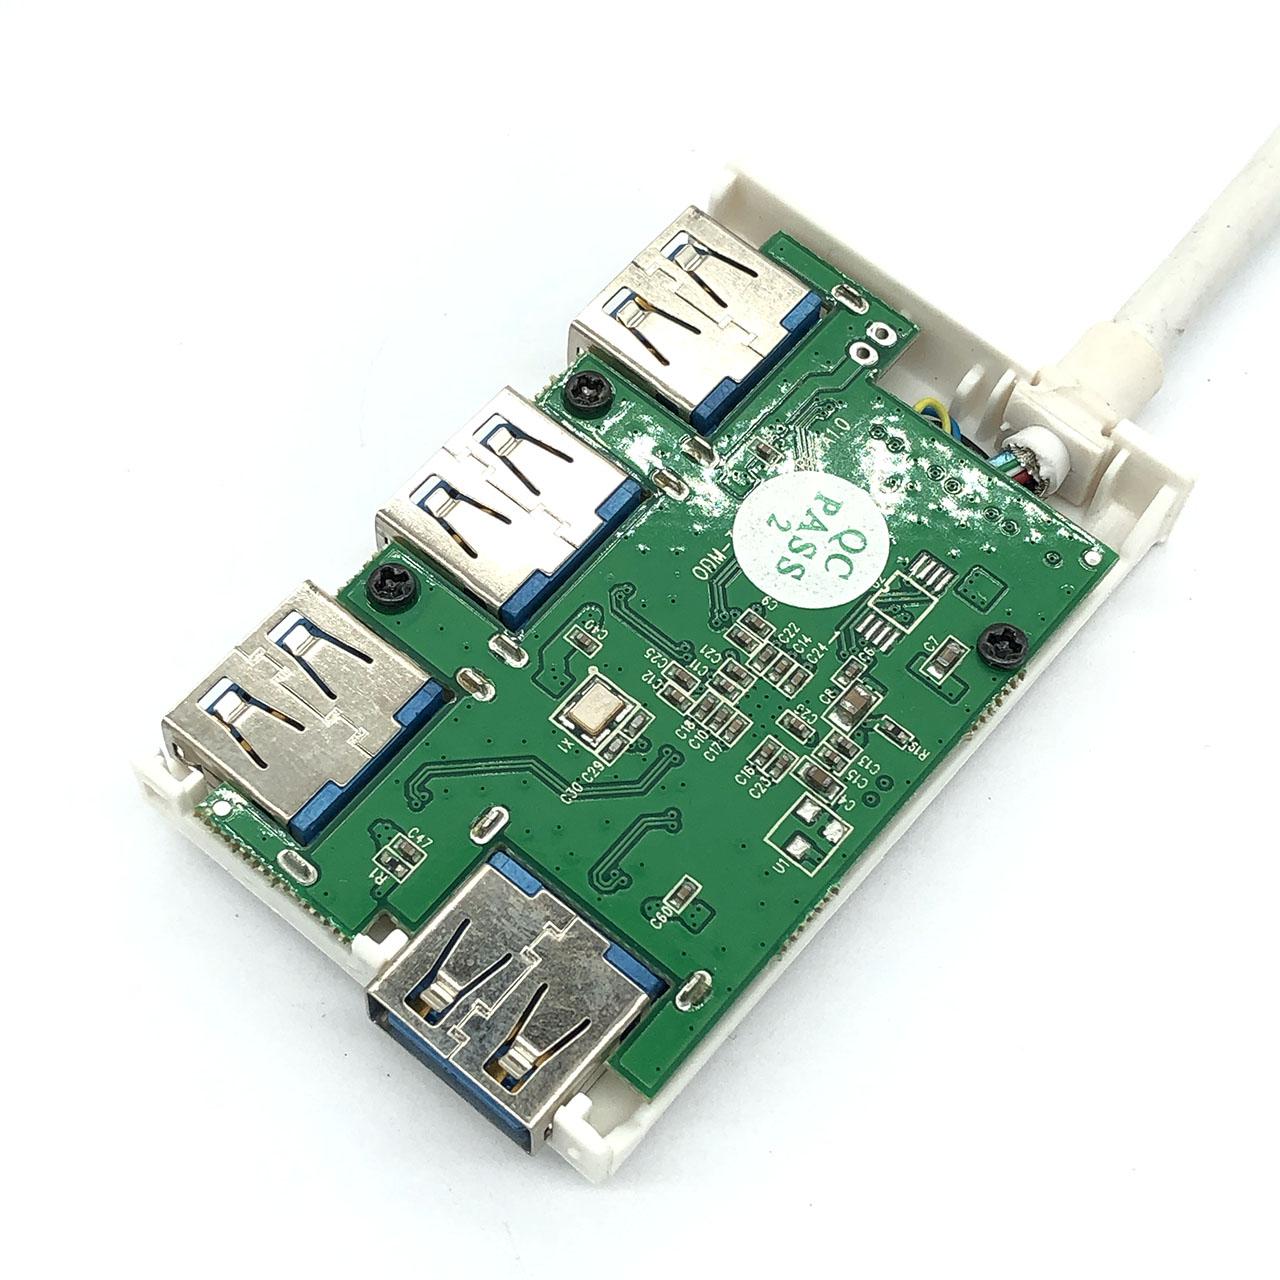 拆解Type c 转USB3.0 转换器头 集线器USB C TO USB A Adapter 4 x USB A 3.1 Gen1 5Gb/s Adapter VLI813-Q7